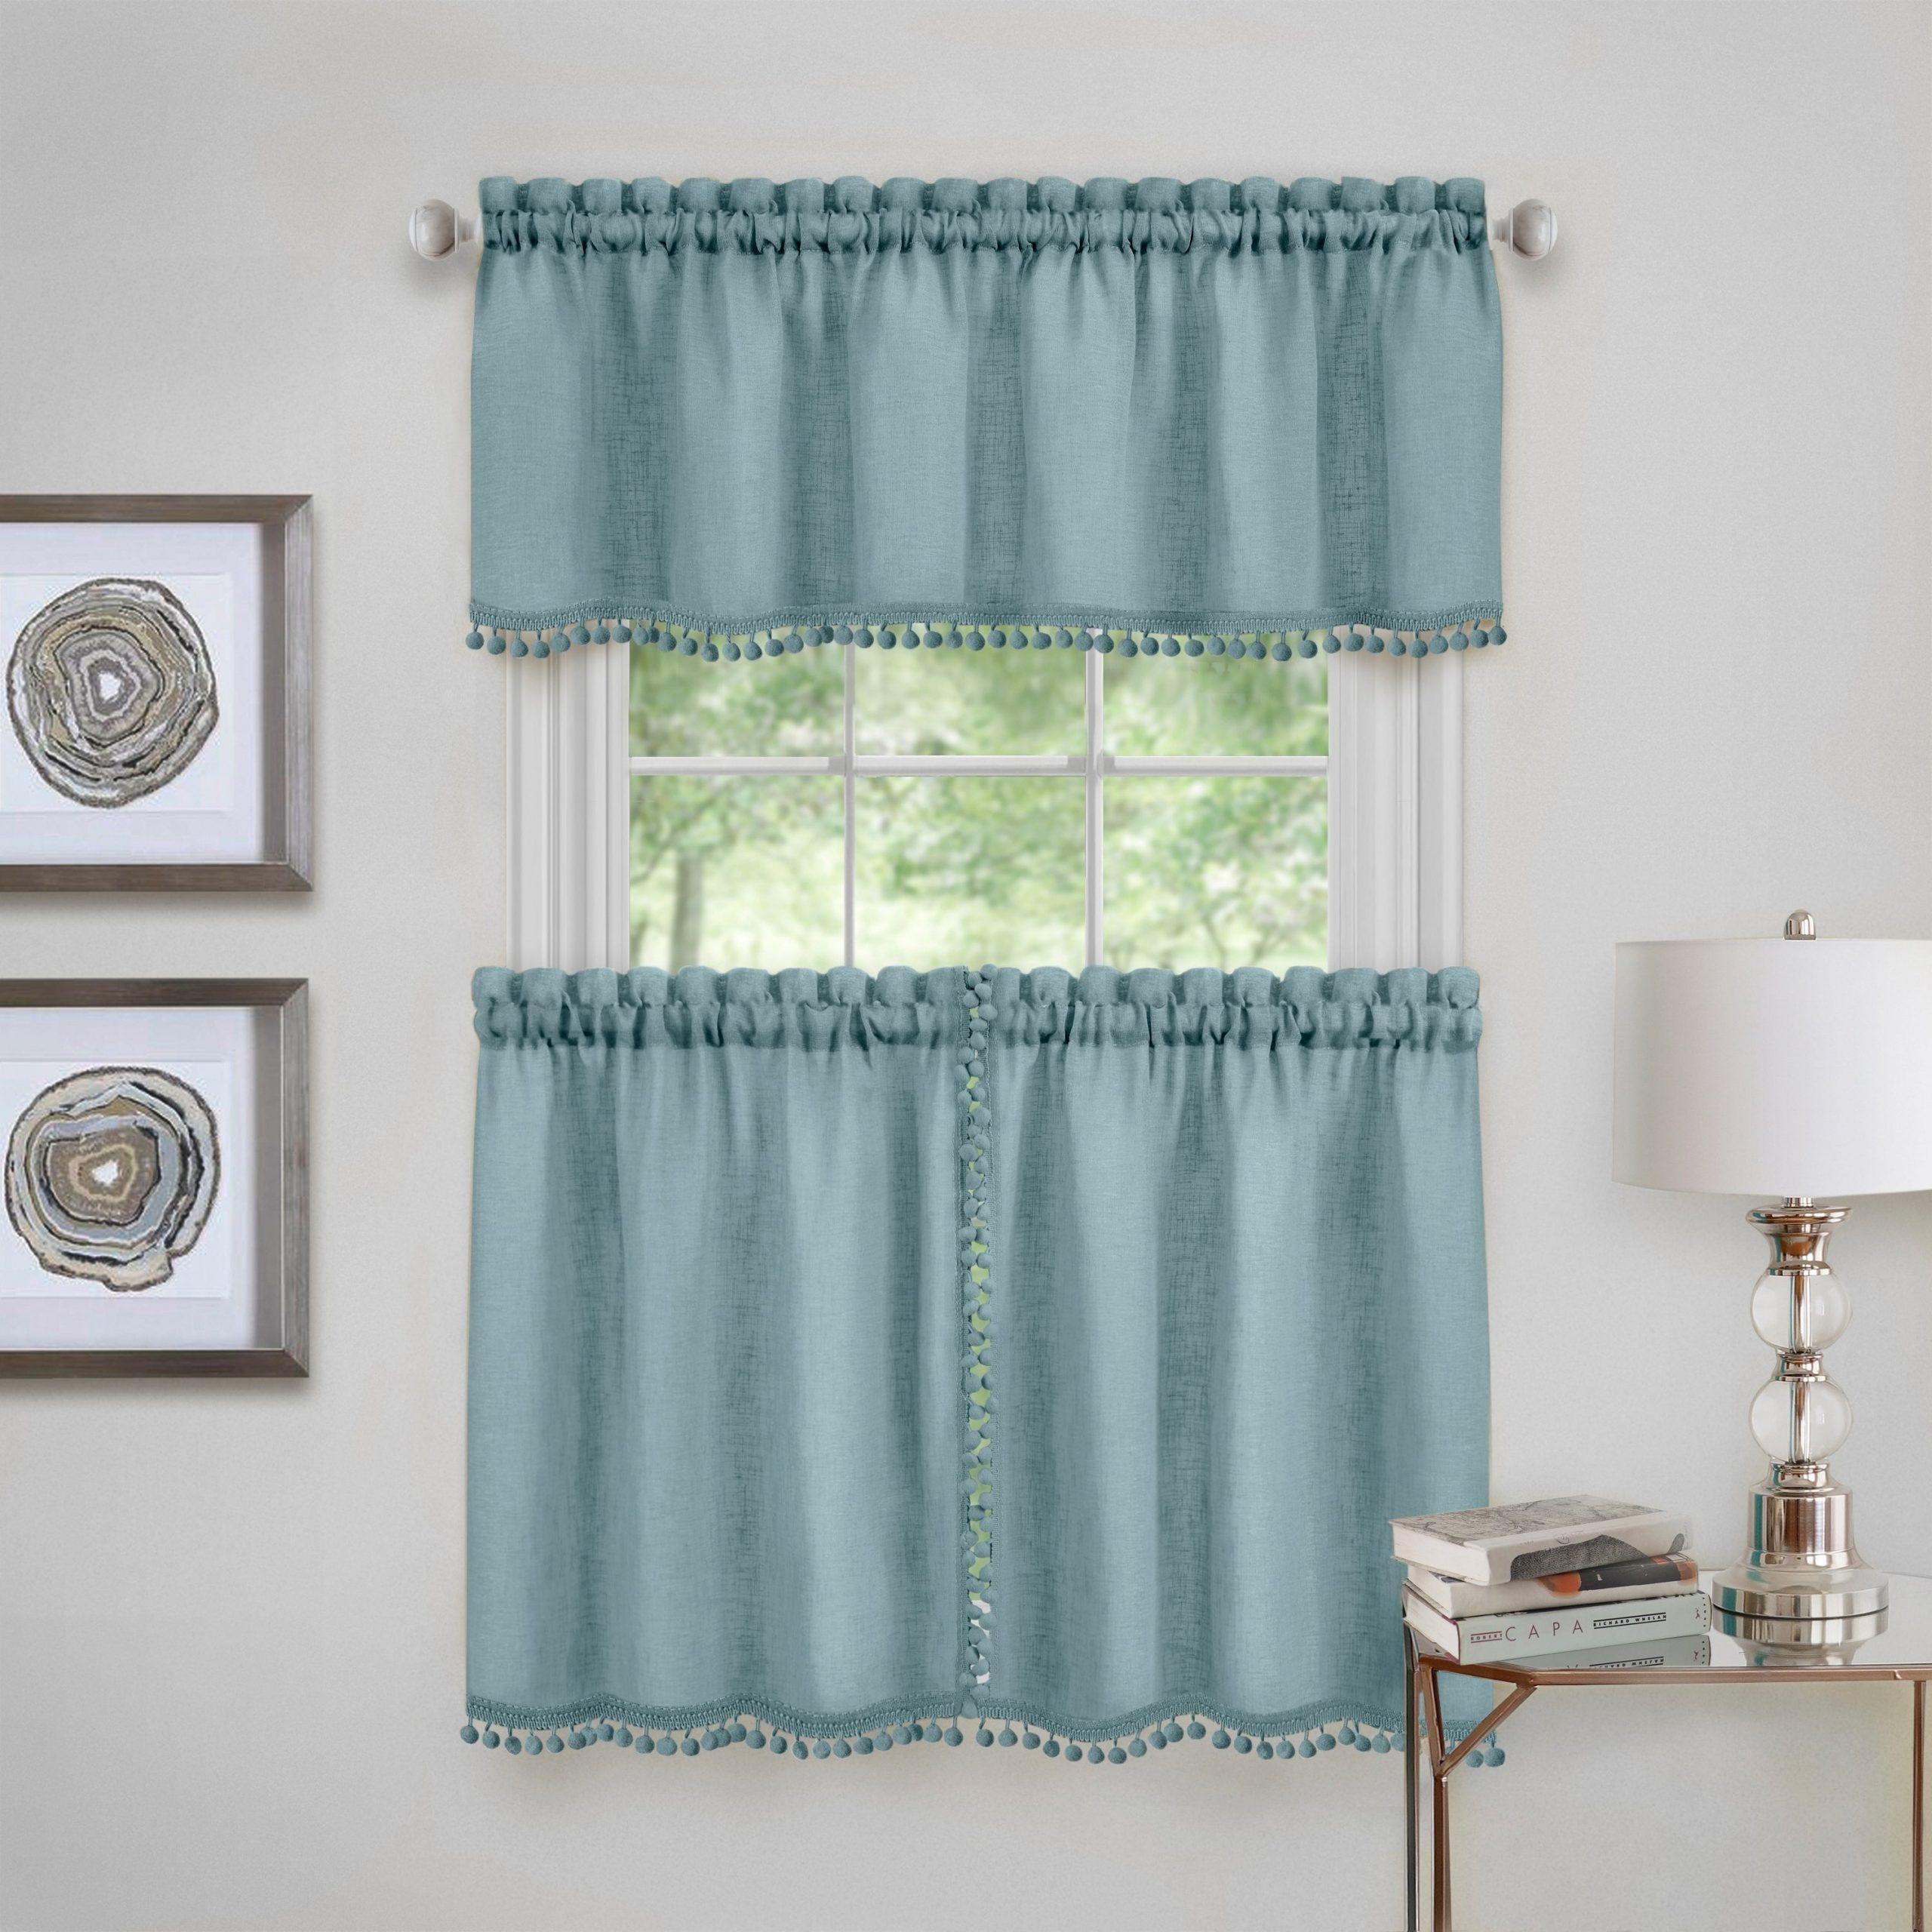 Wallace Window Kitchen Curtain Tier Pair And Valance Set With Regard To Dakota Window Curtain Tier Pair And Valance Sets (View 6 of 20)